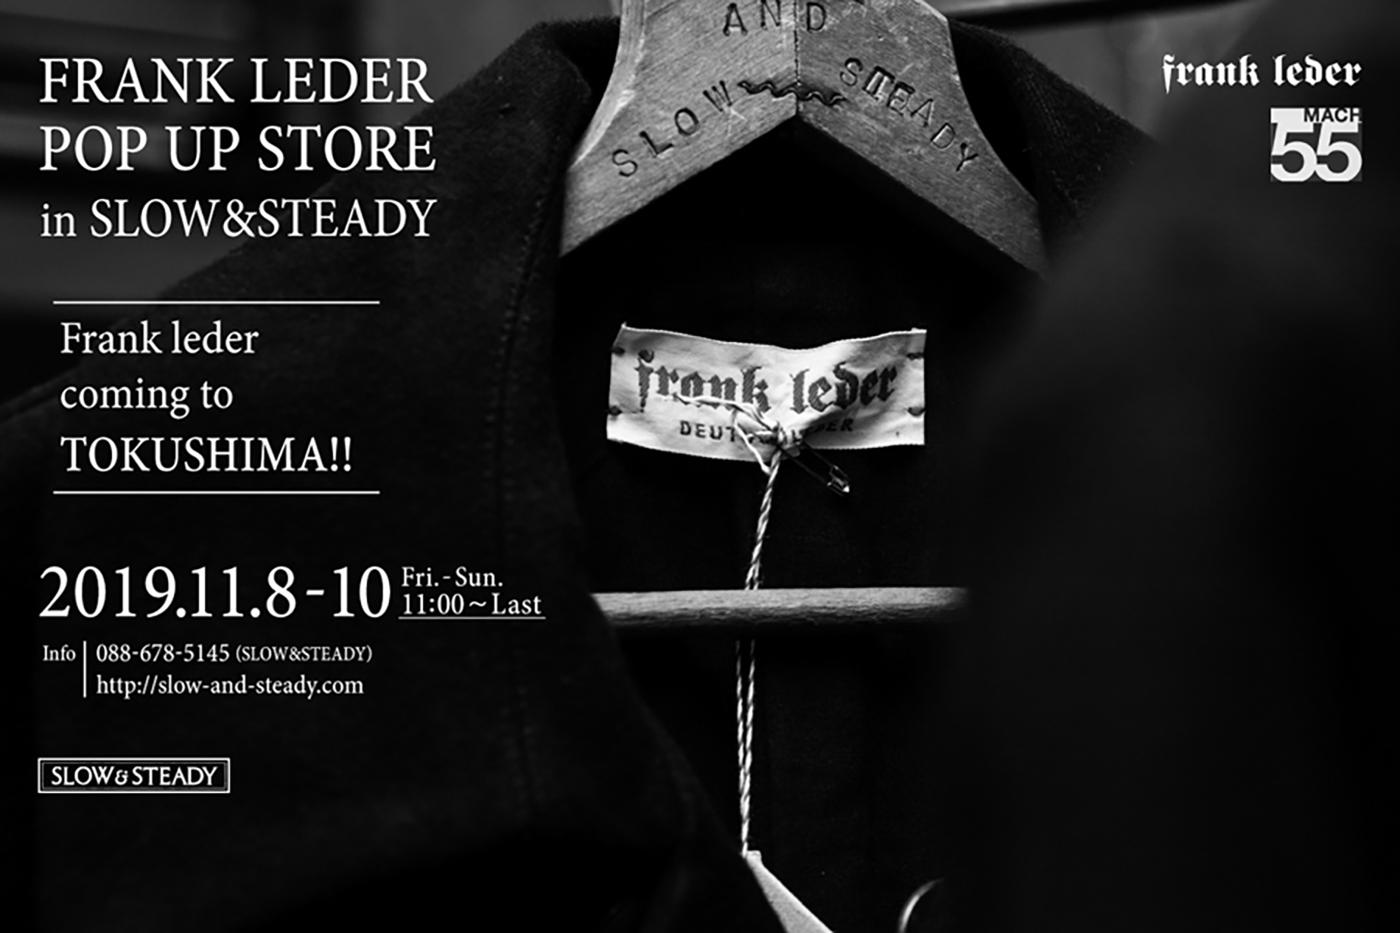 FRANK LEDER POP UP STORE in SLOW&STEADY